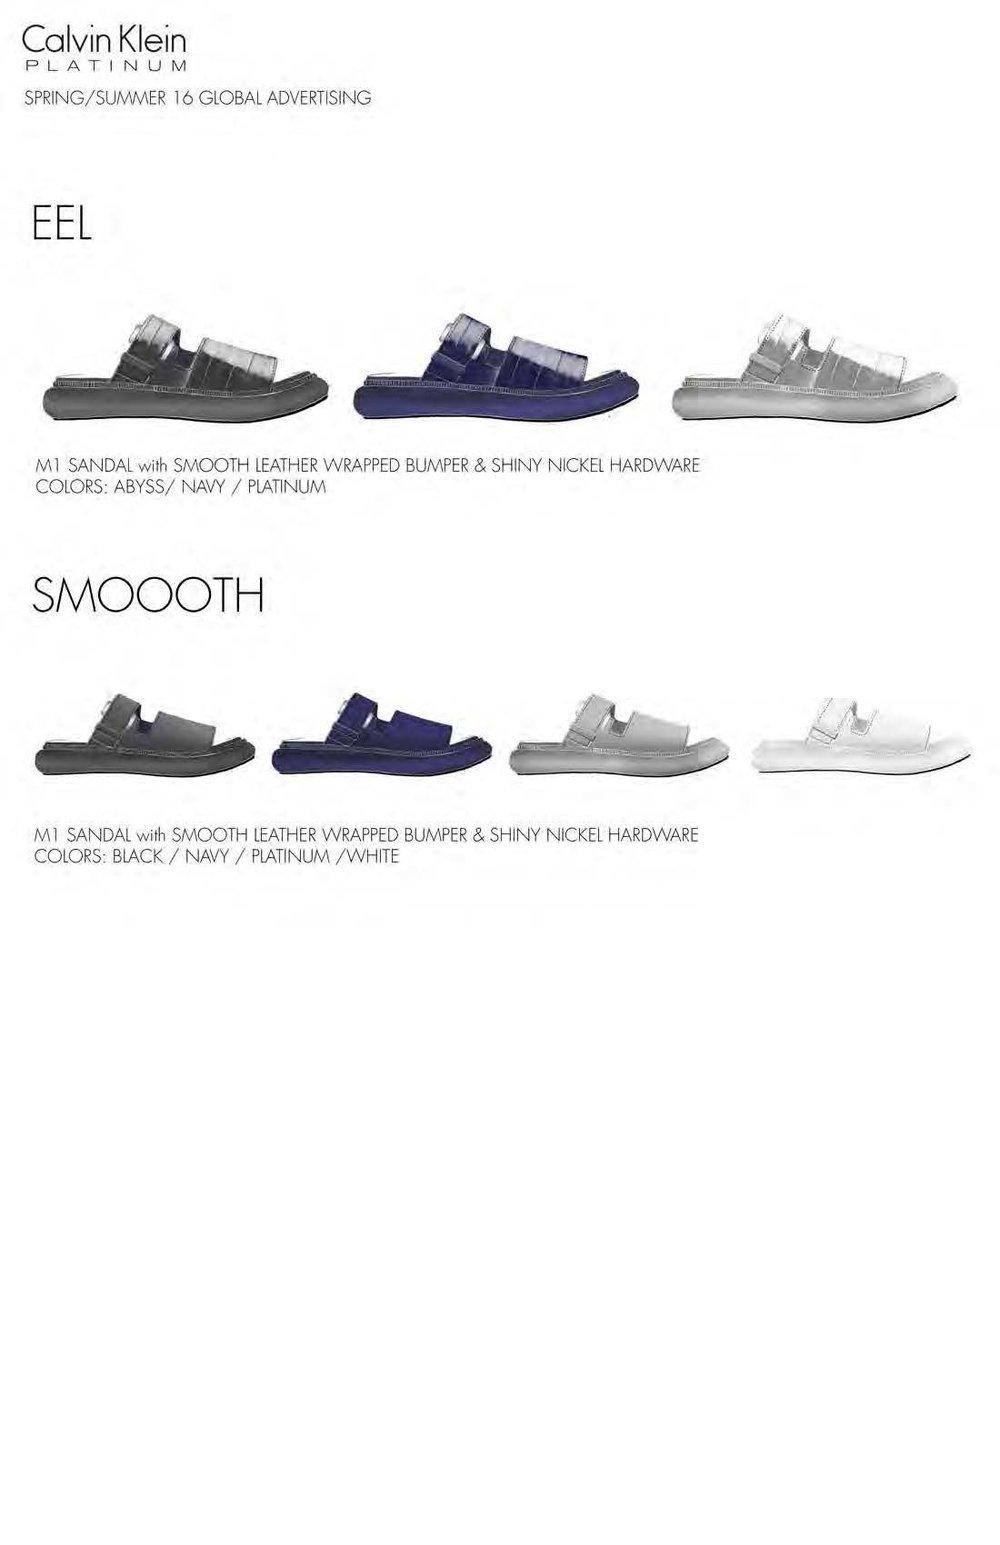 7.KGRESS Portfolio-SS16 CKP AD Footwear_Page_09.jpg